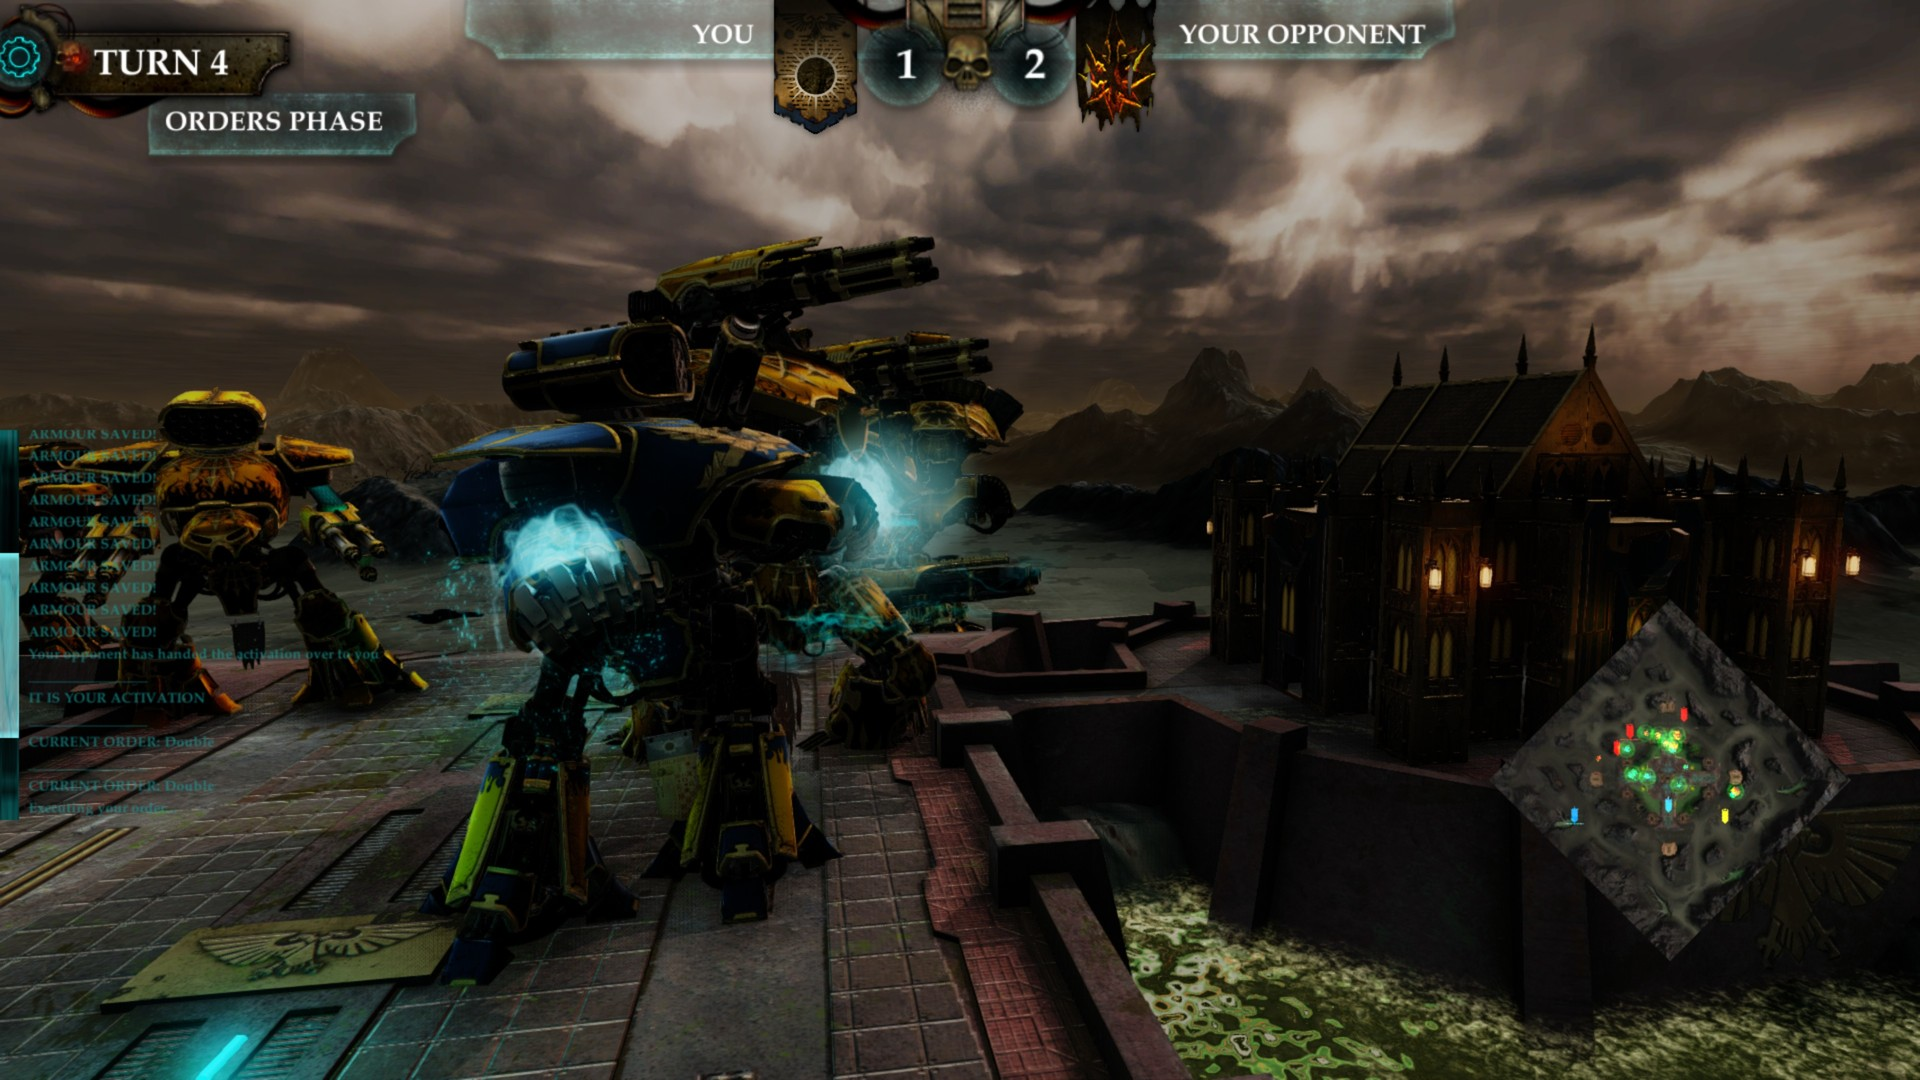 Warhammer 40K dating ιστοσελίδα Αποστολή πρώτου μηνύματος σε απευθείας σύνδεση ιστοσελίδα γνωριμιών